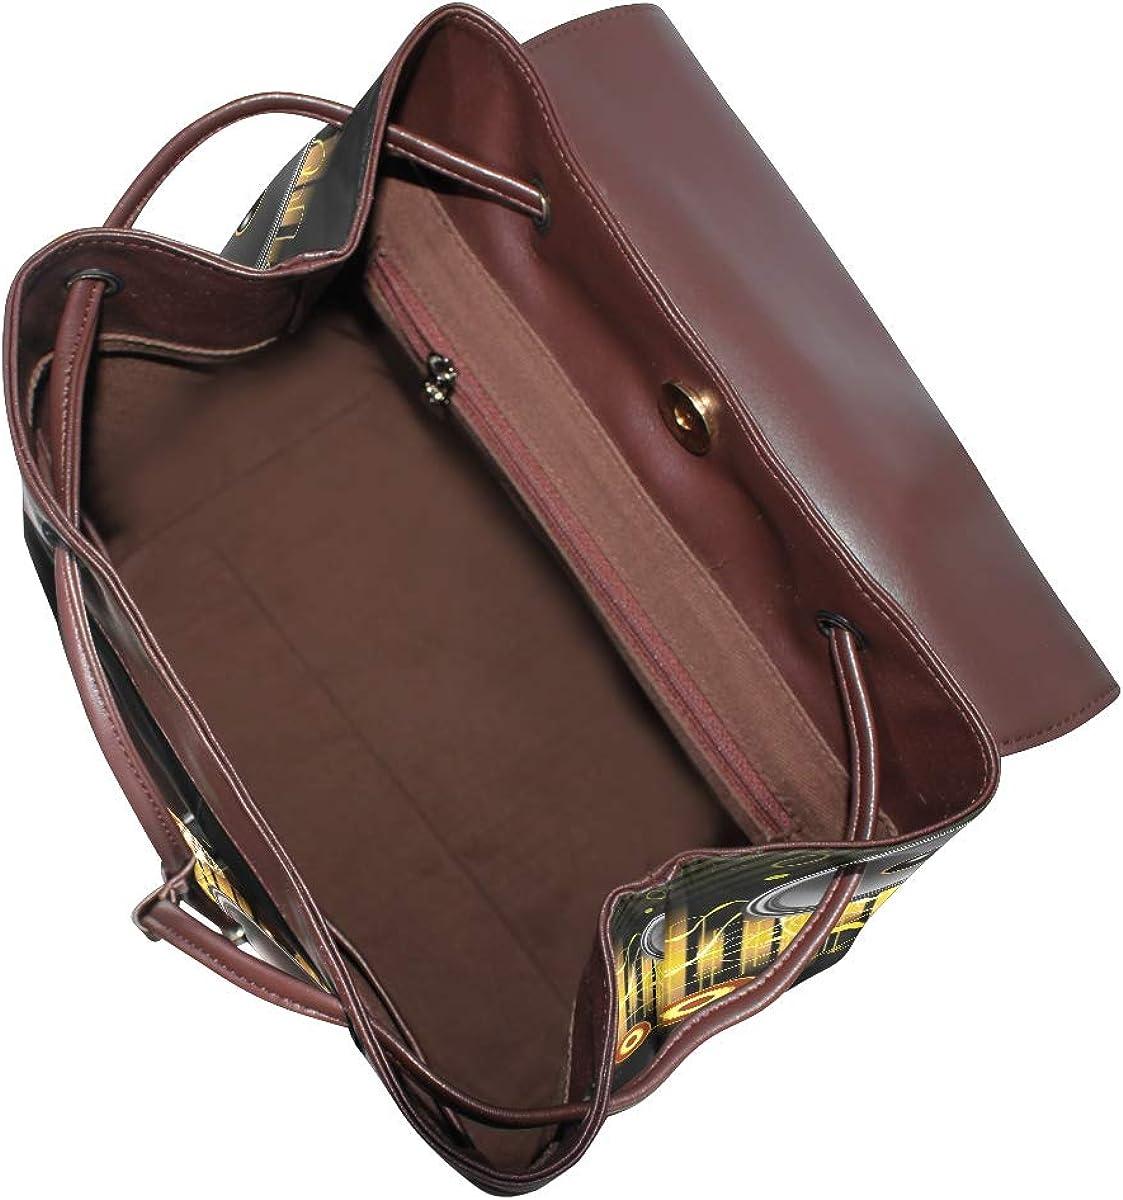 PU Leather Shoulder Bag,Different Speakers Backpack,Portable Travel School Rucksack,Satchel with Top Handle